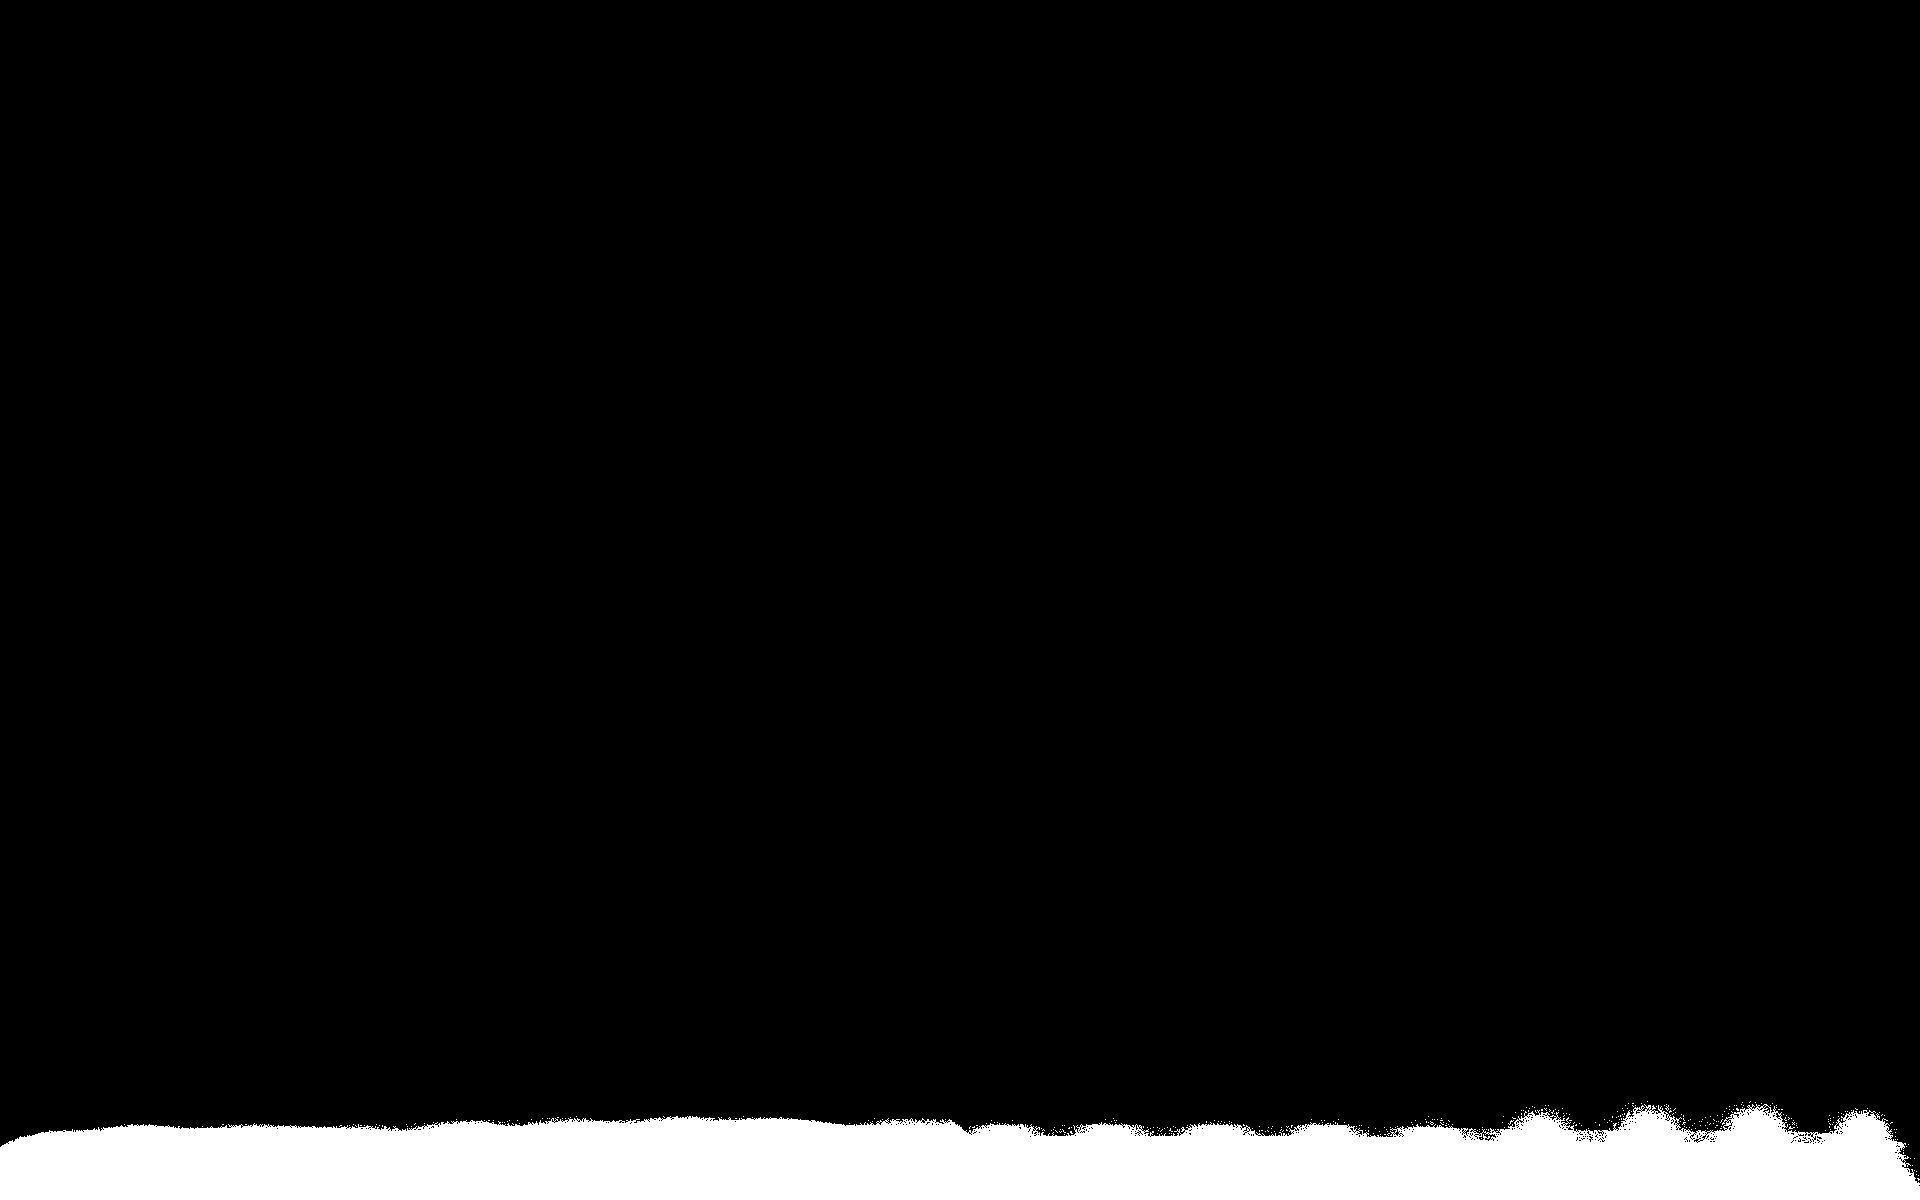 main-overlay-img-2.png